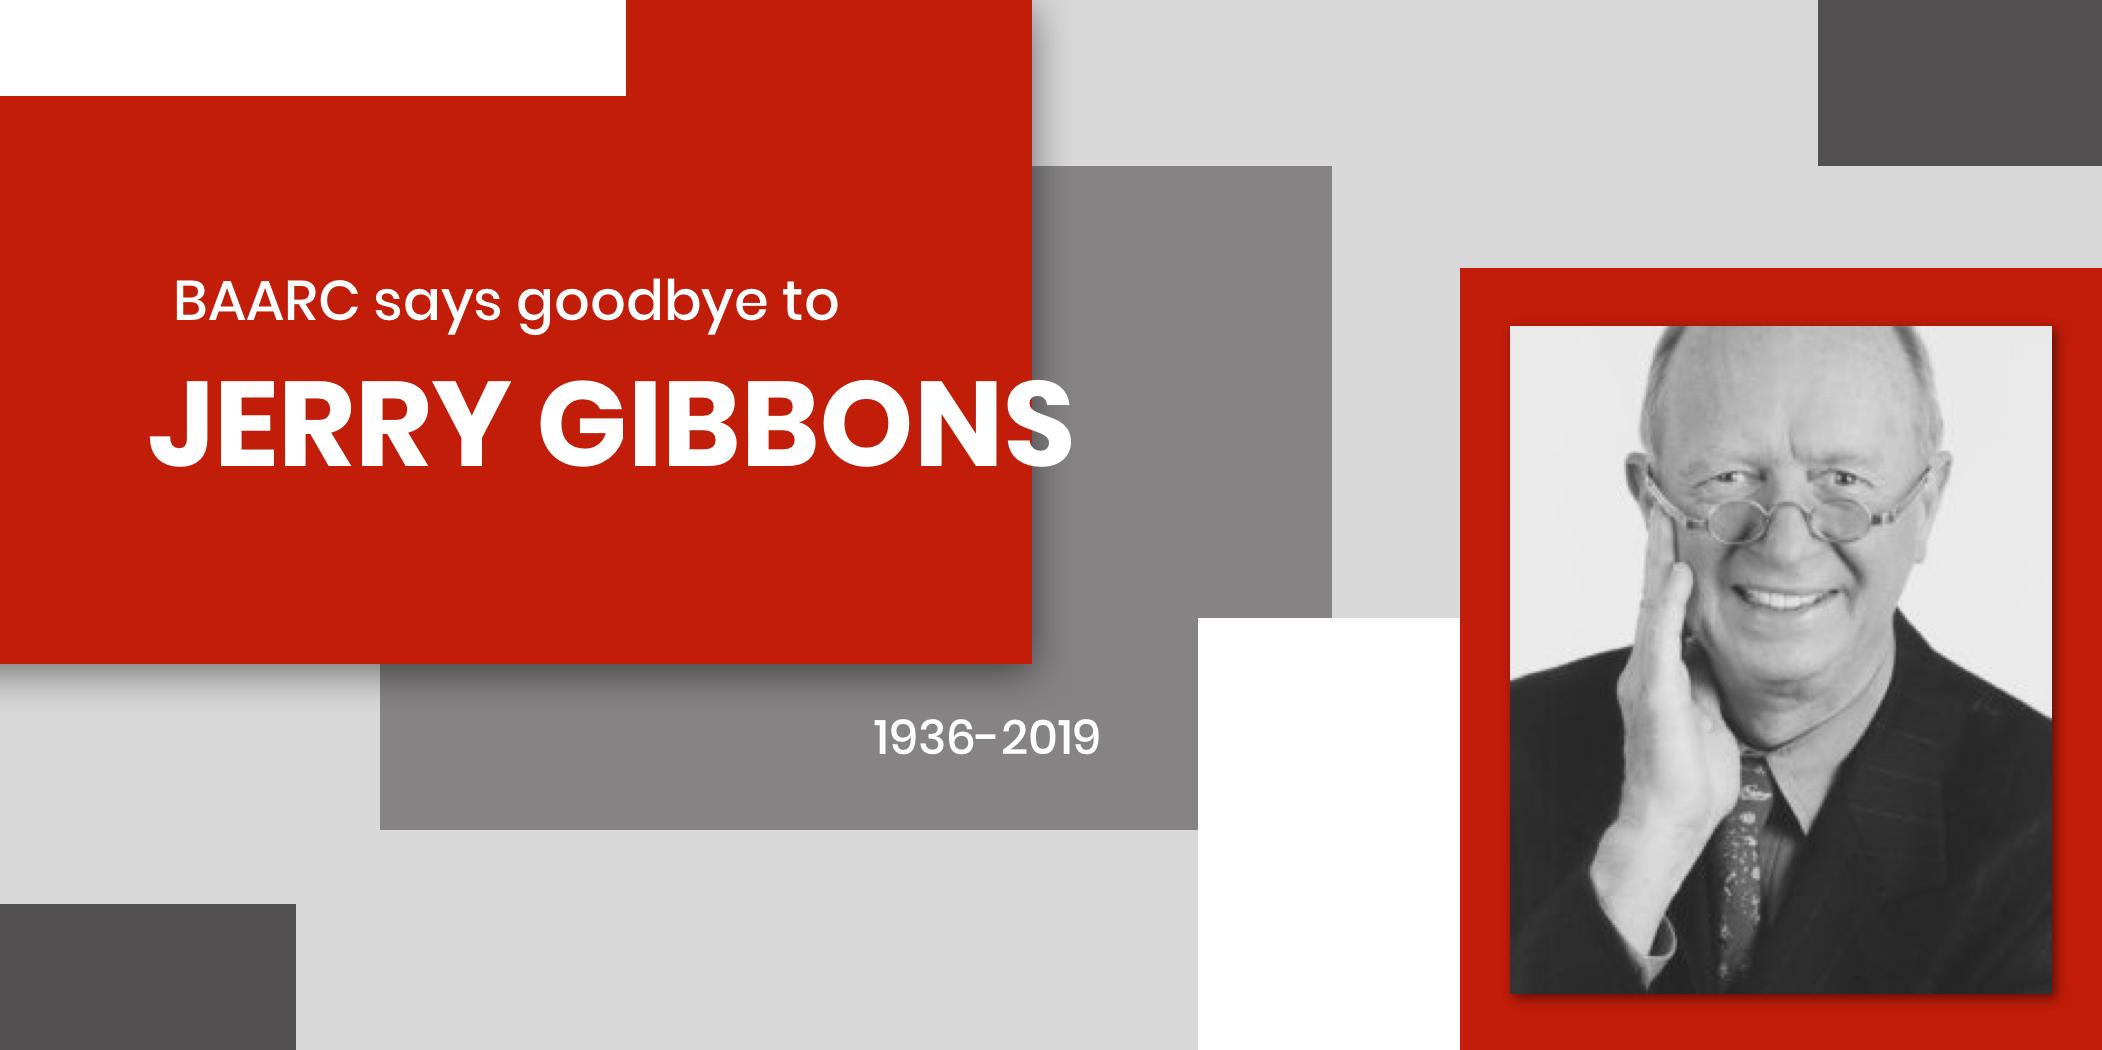 jerry gibbons slider.png